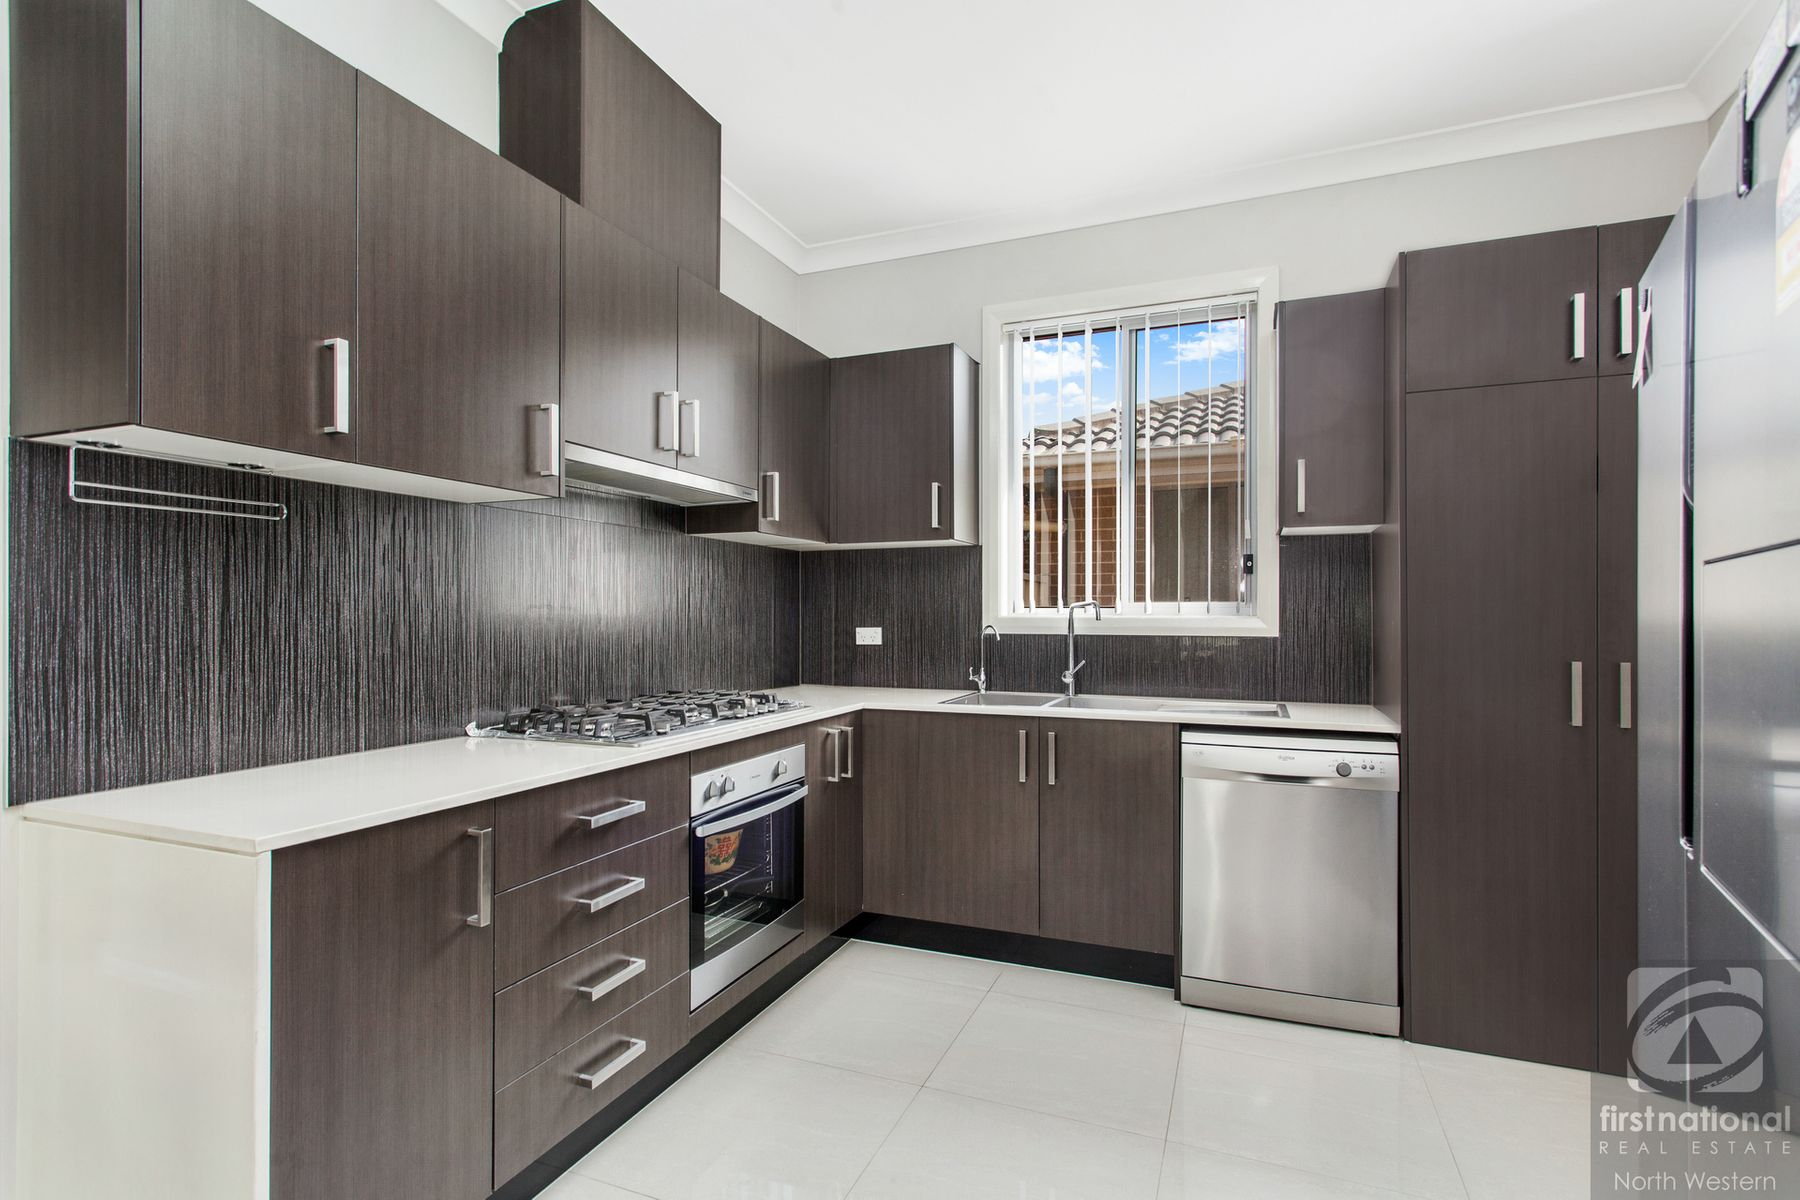 3/54 Camilleri Avenue, Quakers Hill, NSW 2763